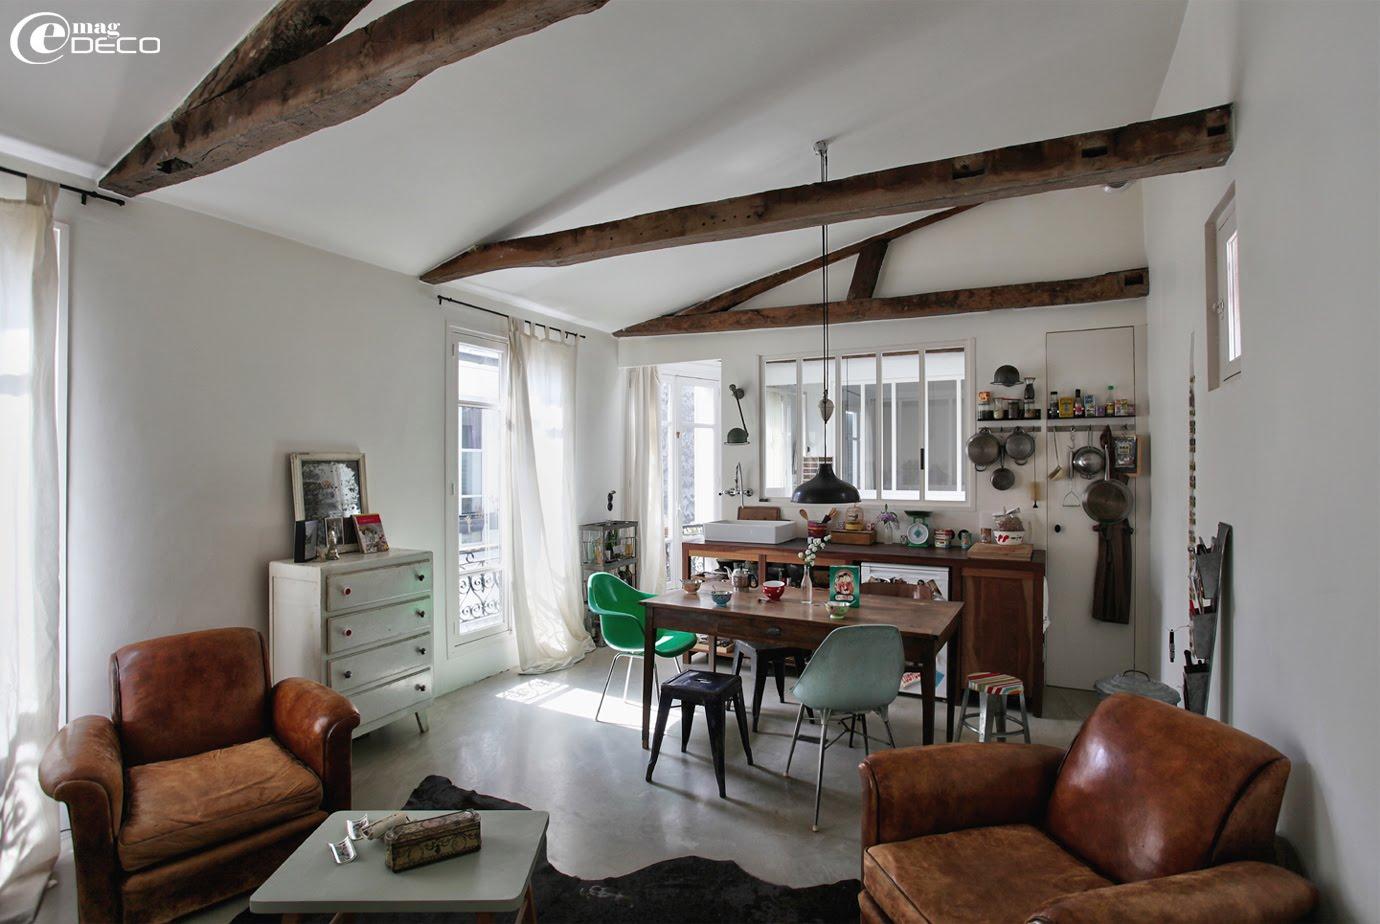 transparence et esprit brocante e magdeco magazine de d coration. Black Bedroom Furniture Sets. Home Design Ideas